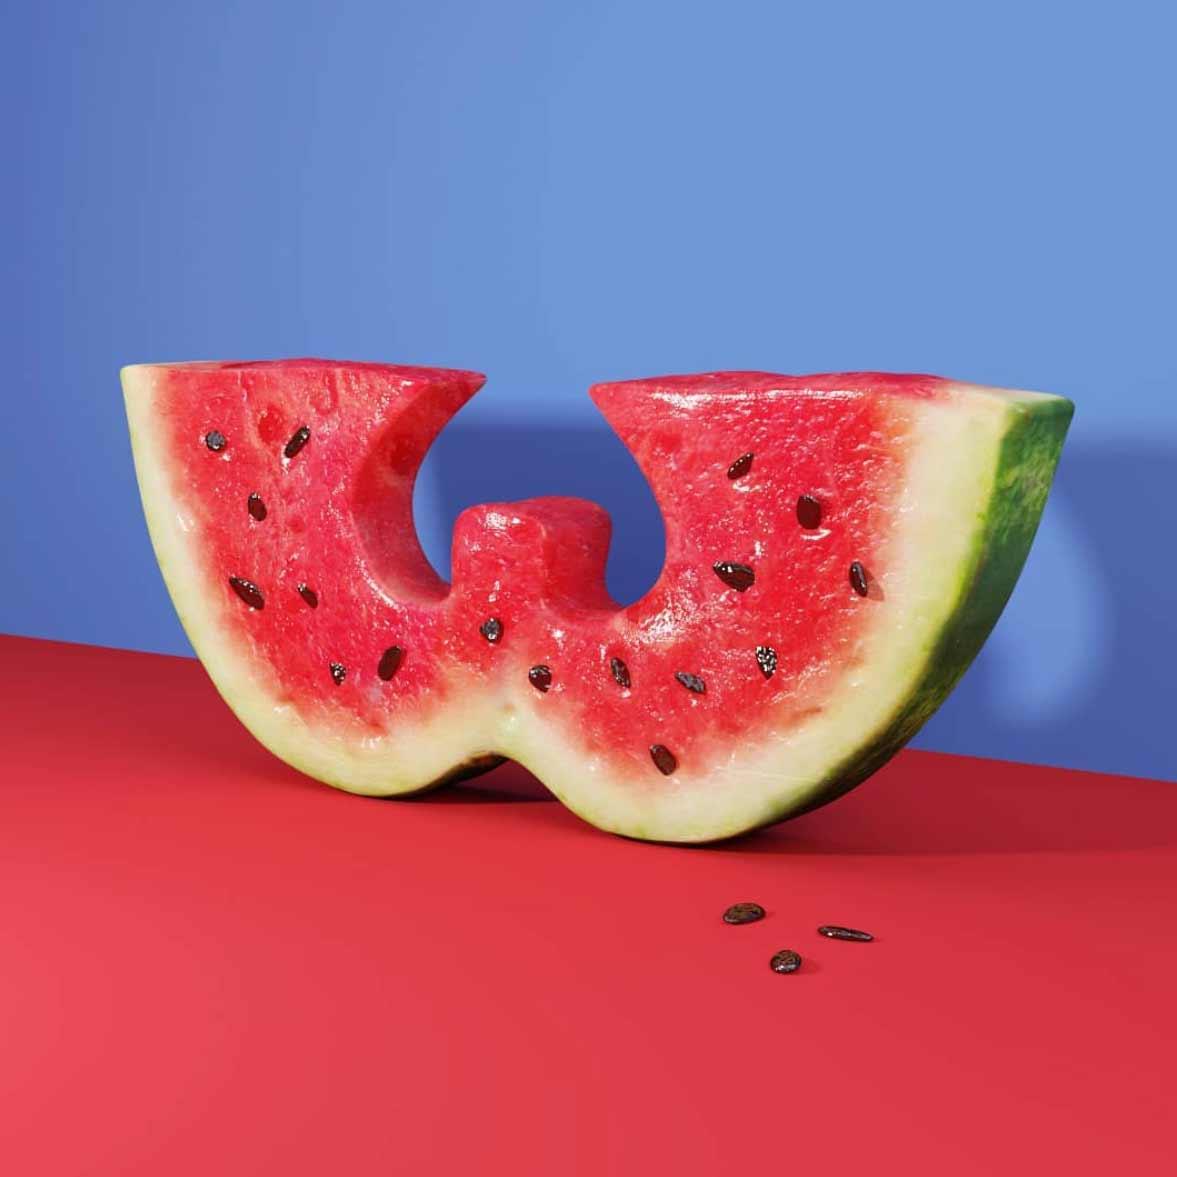 Unterhaltsame 3D-Kunst von Ben Chelouche Ben-Chelouche-3d-food_07